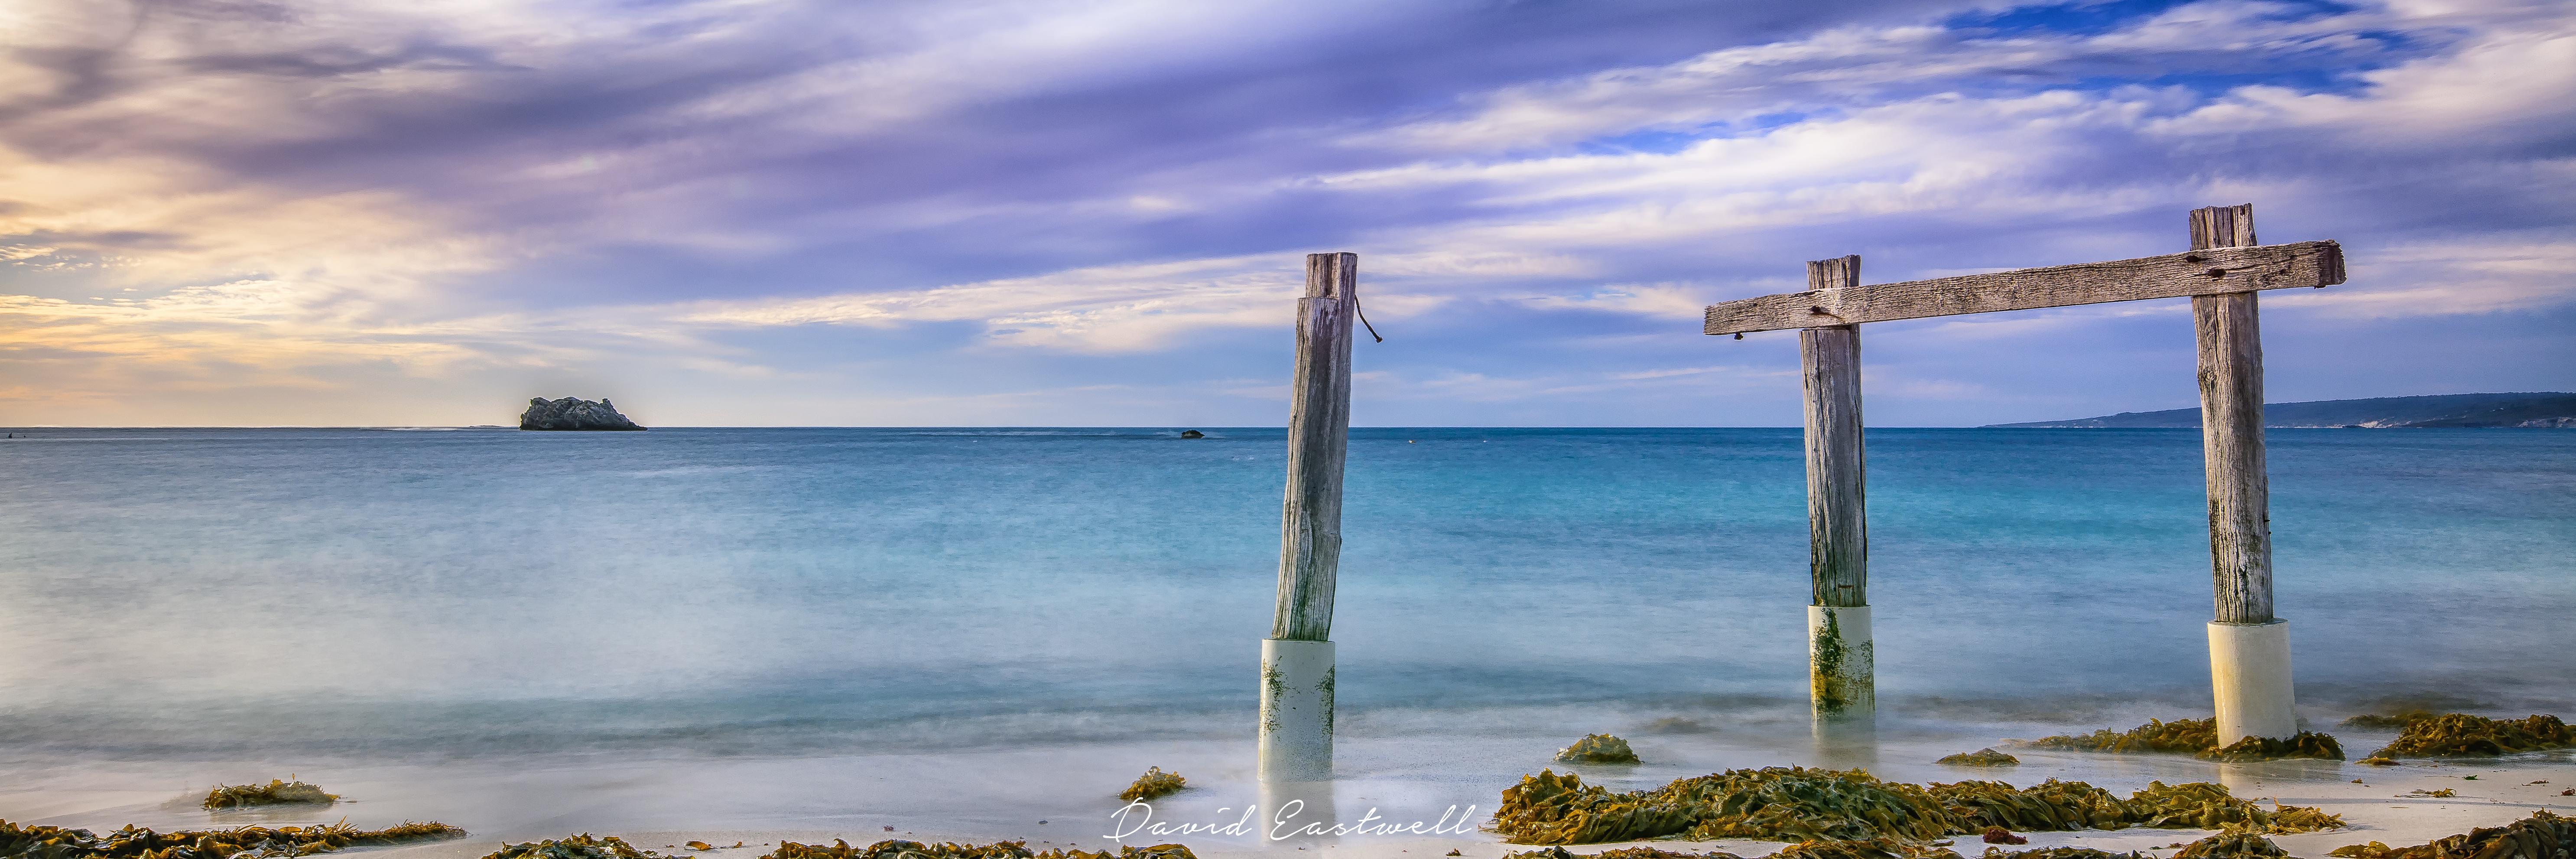 Australia Hamlin Bay 3